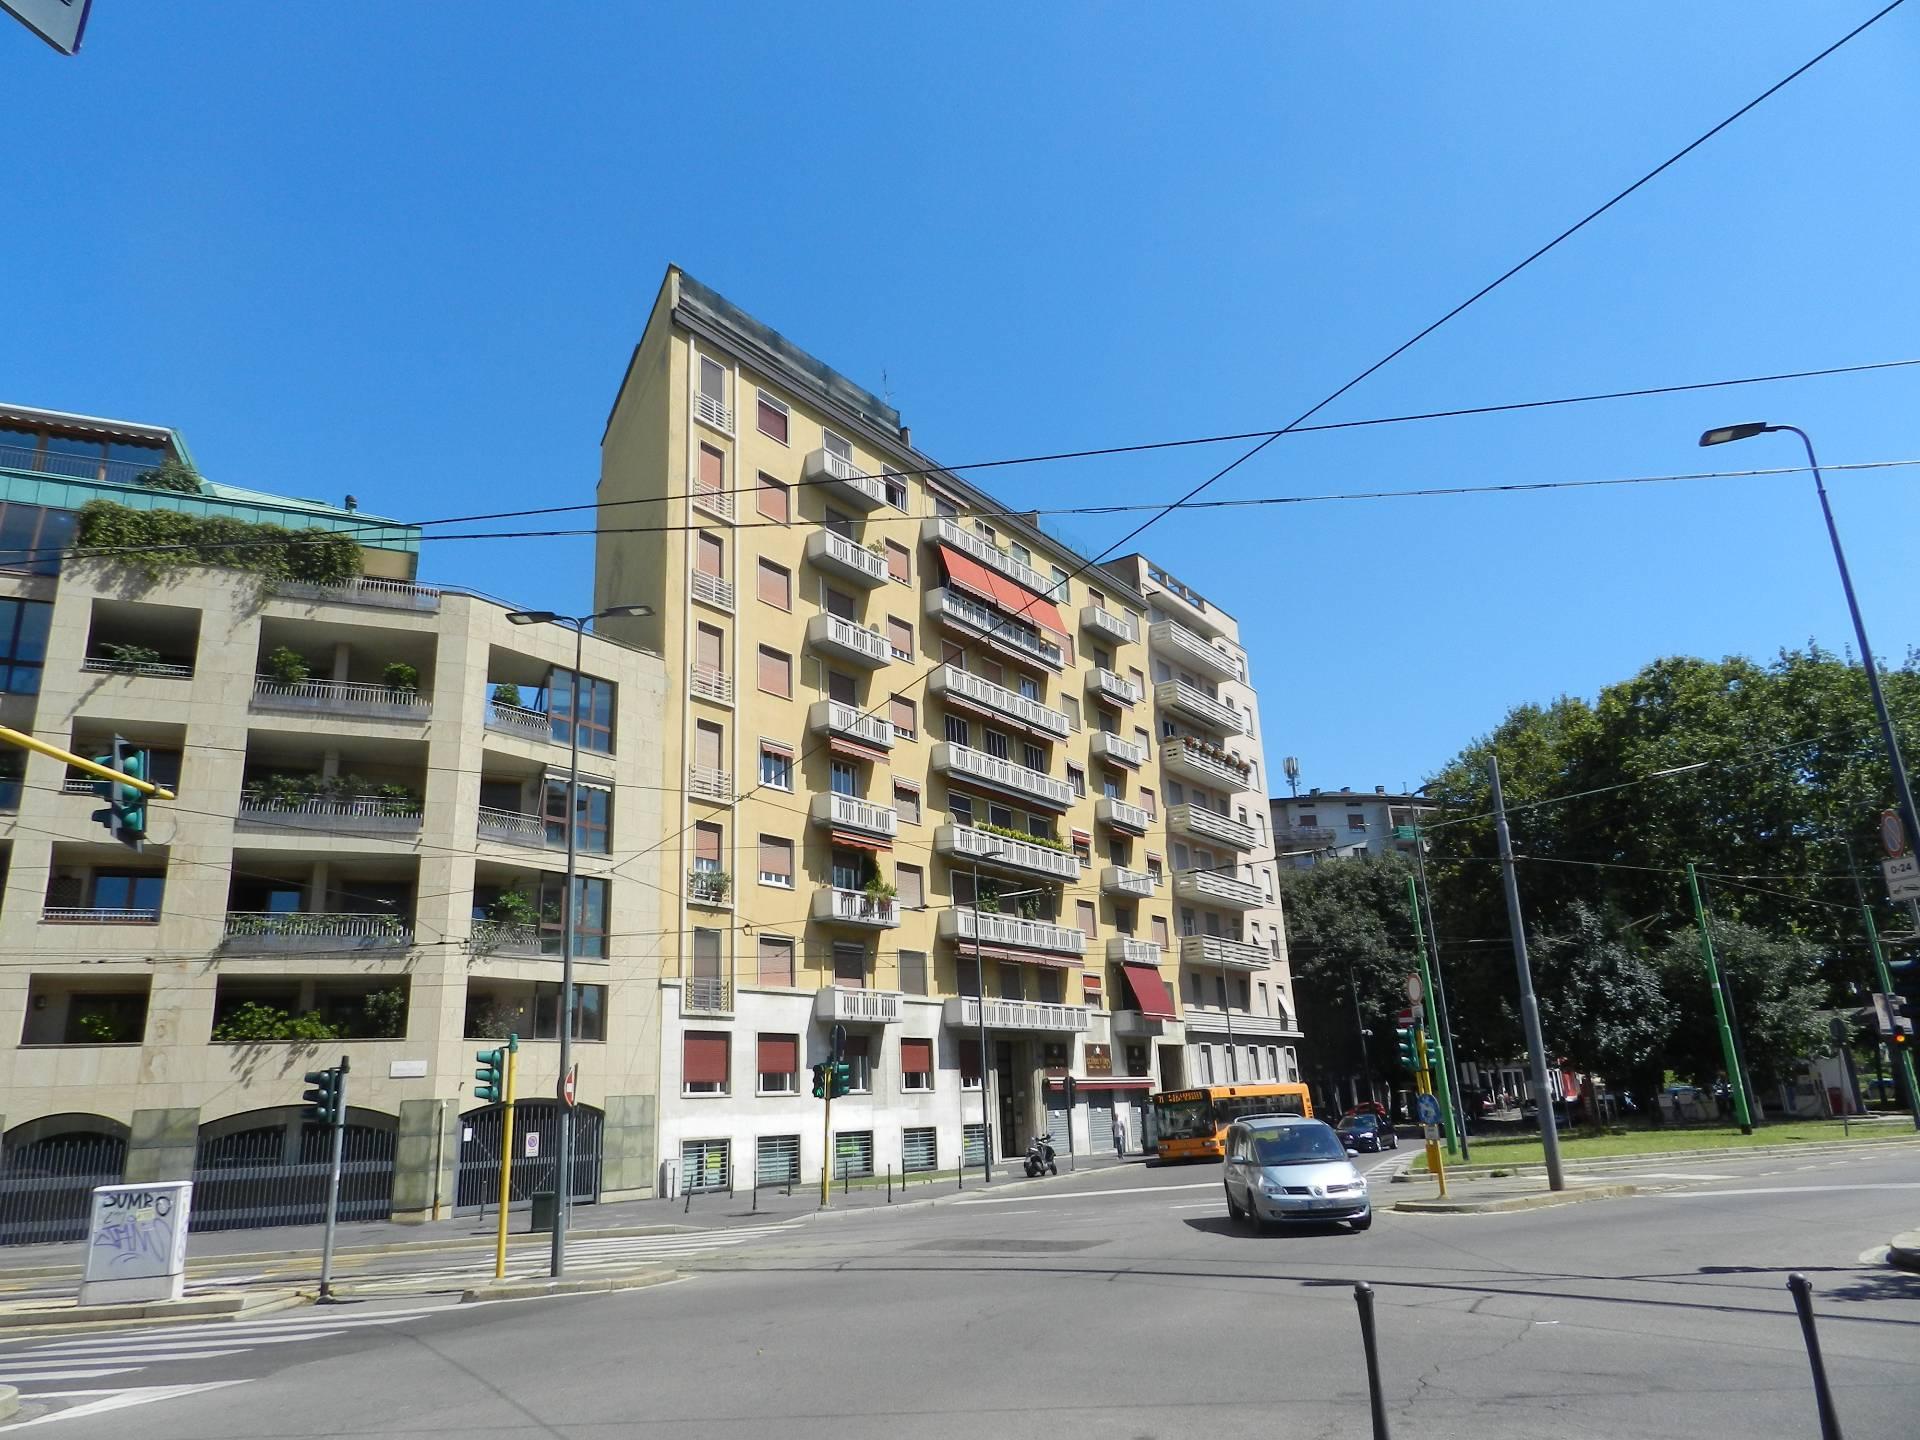 Milano | Appartamento in Vendita in Via Gian Carlo Castelbarc | lacasadimilano.it